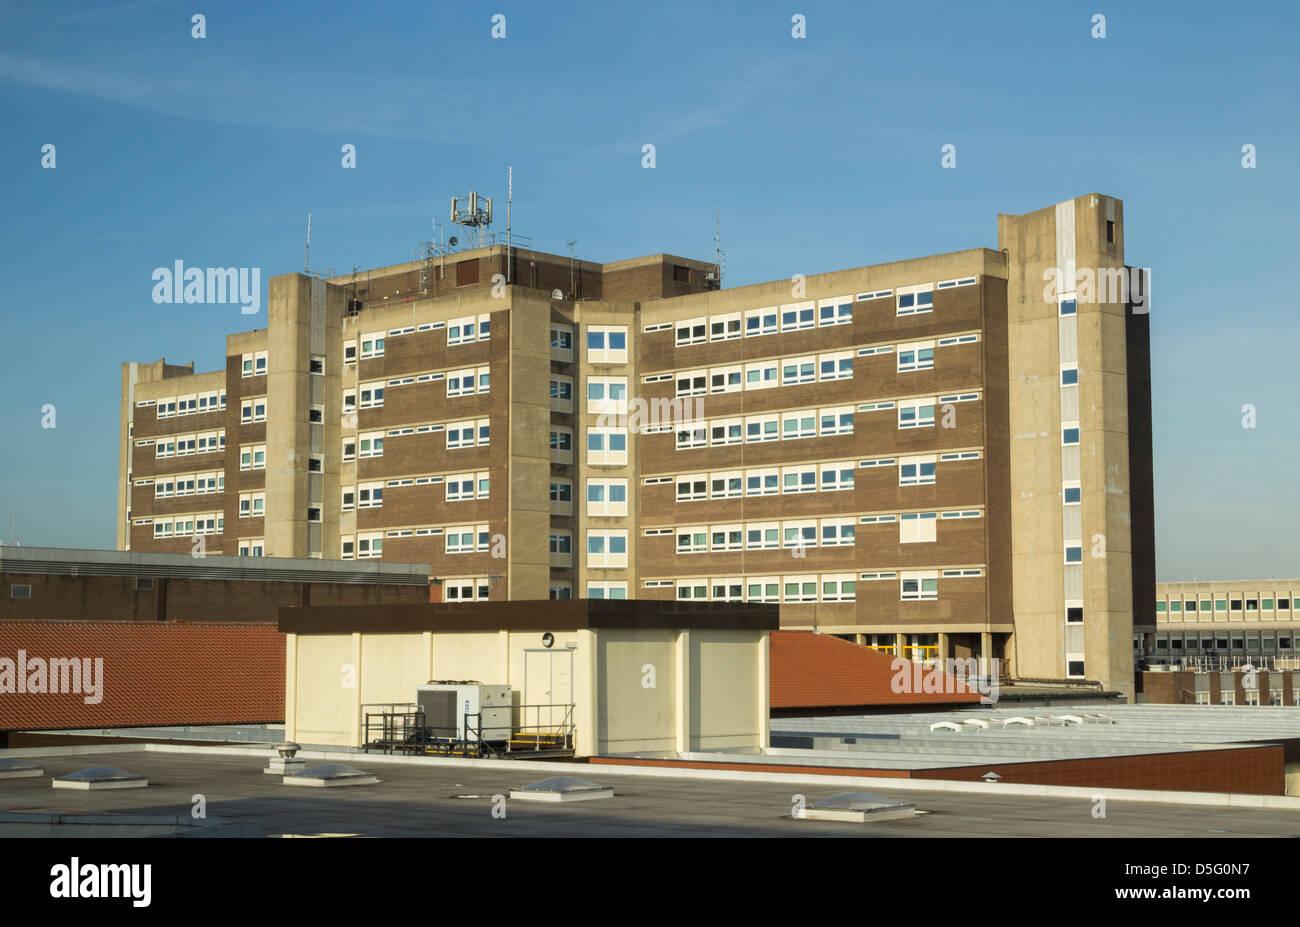 North Tees Hospital Hardwick Stockton On Tees Cleveland England Stock Photo 55056211 - Alamy